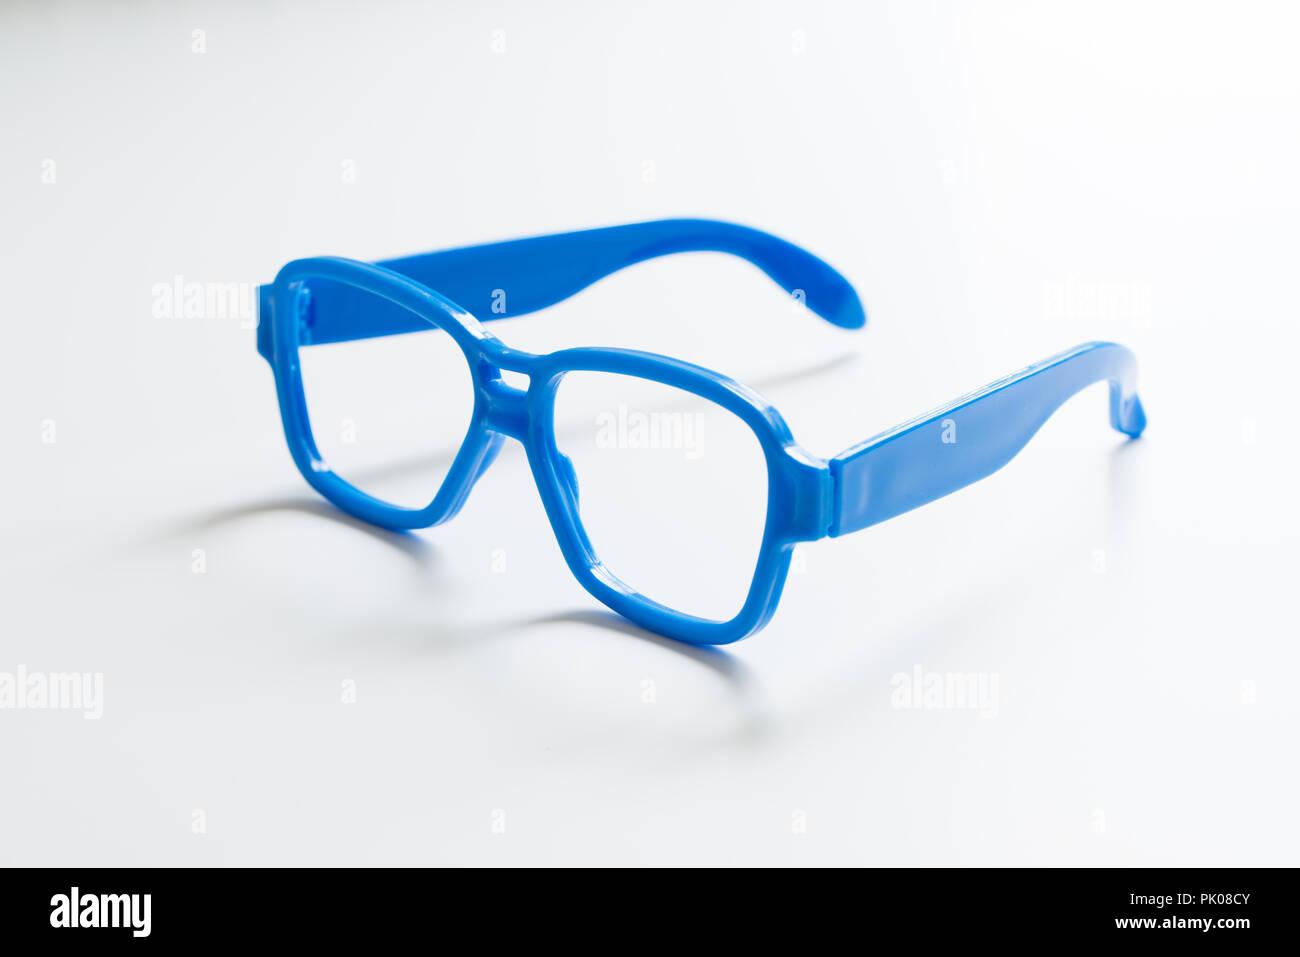 Alamy Fotos Specs Stockamp; Blue De Imágenes SpMVUz